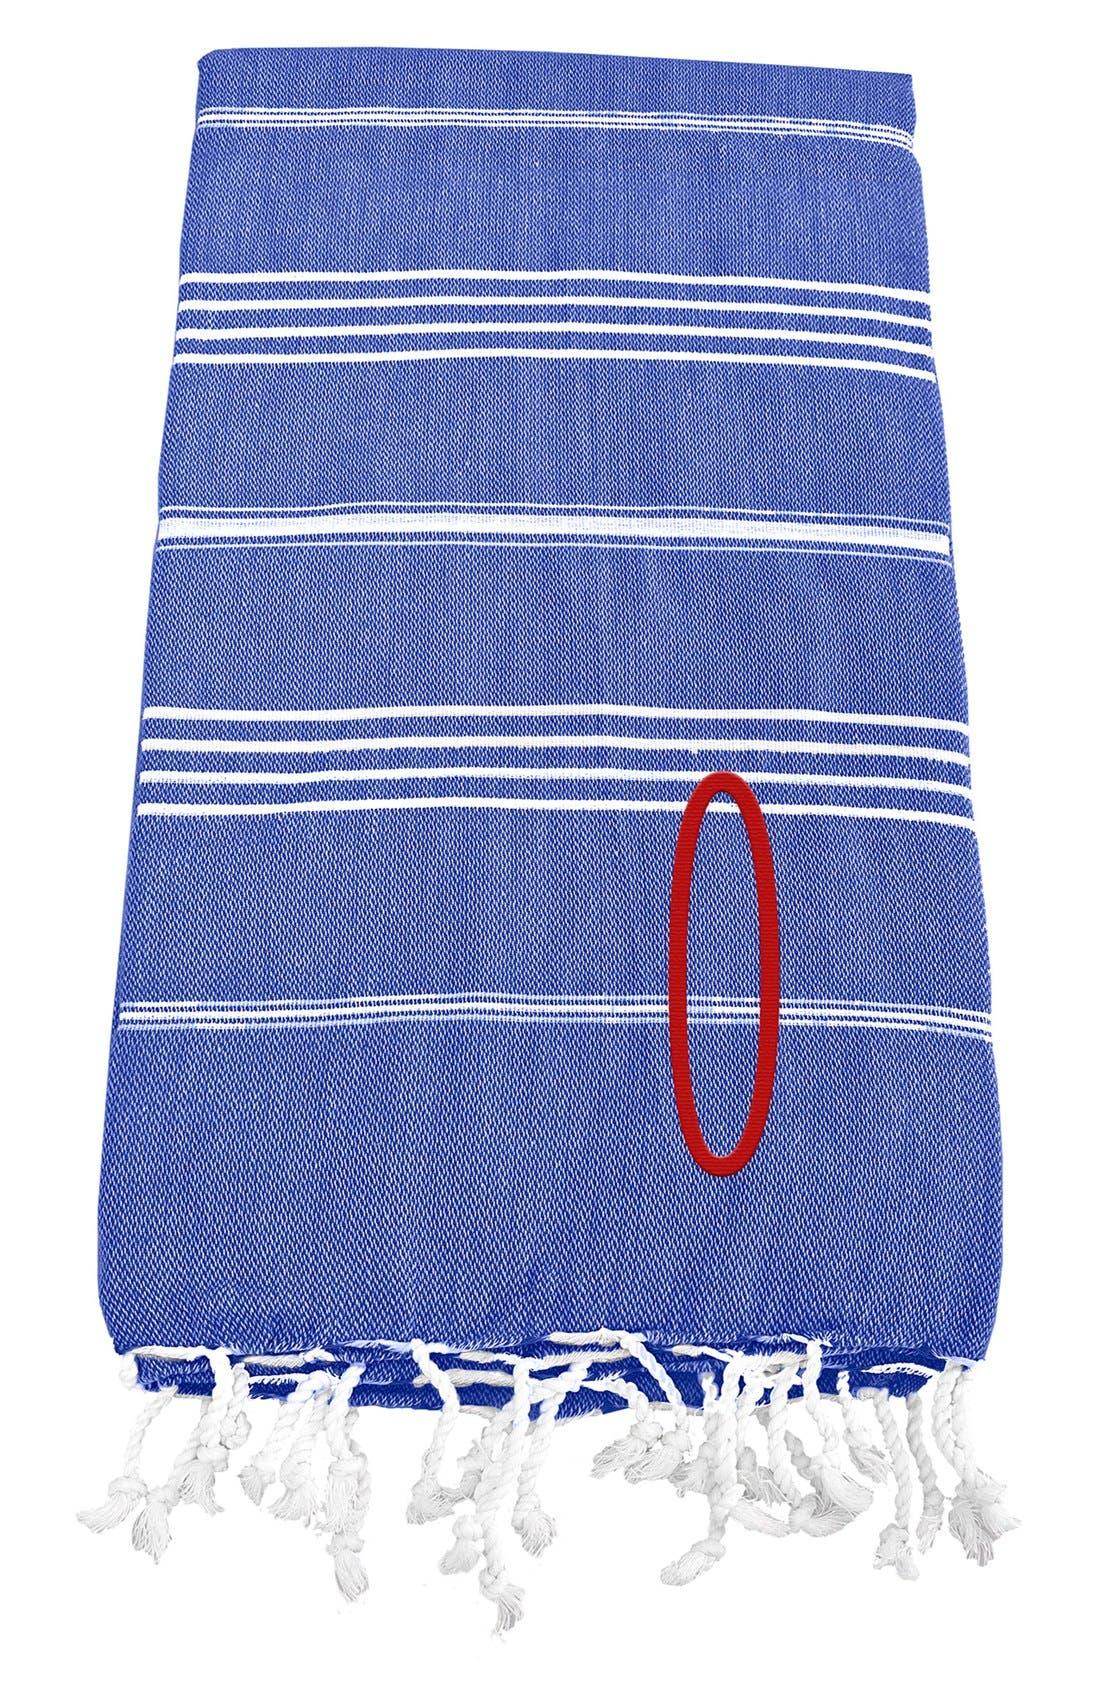 Monogram Turkish Cotton Towel,                             Main thumbnail 71, color,